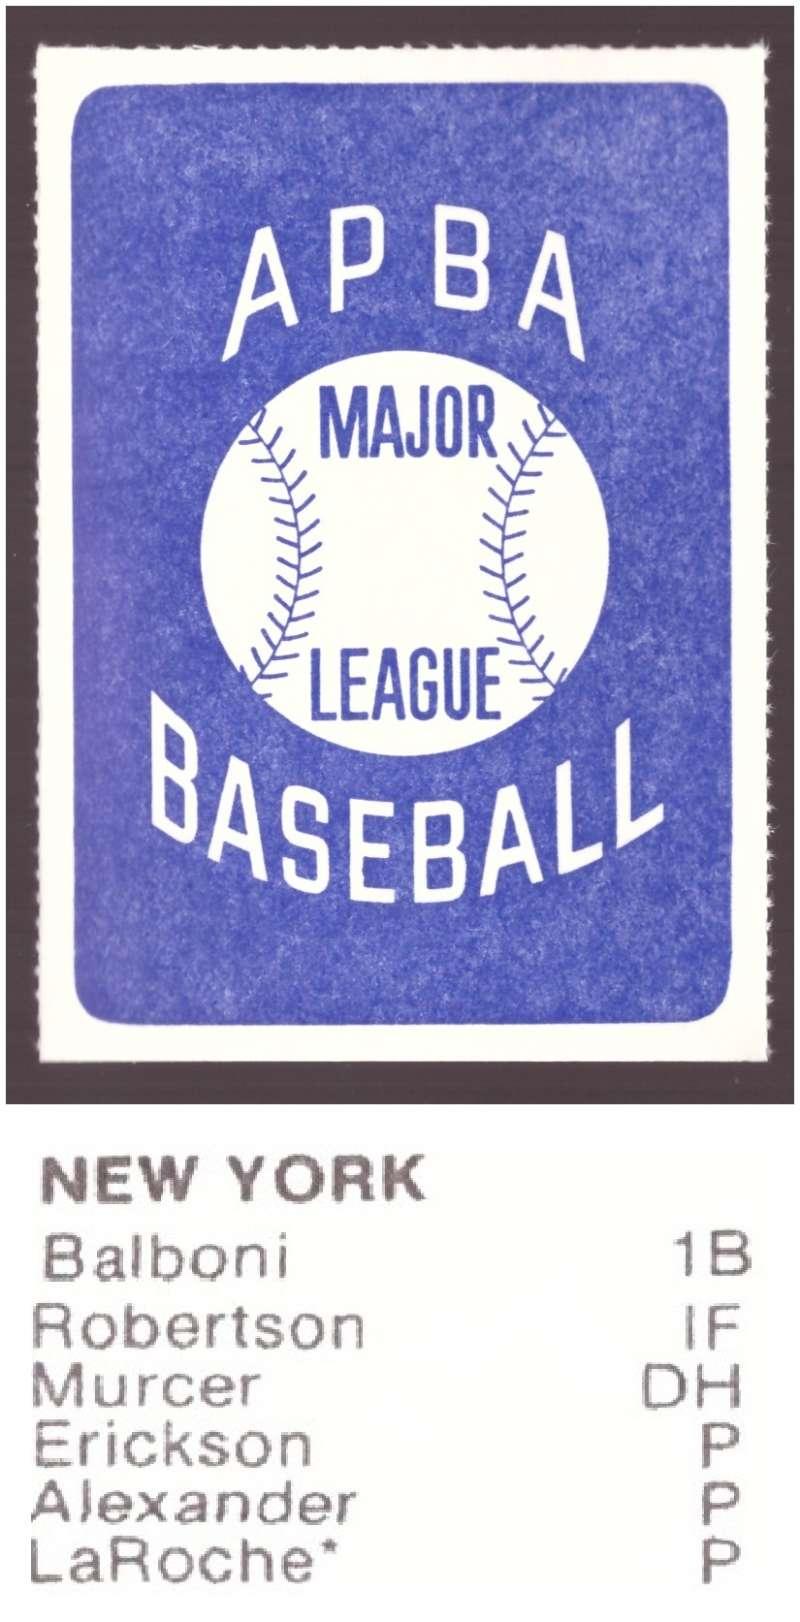 1982 APBA Season Extra Players Only - NEW YORK YANKEES Team Set